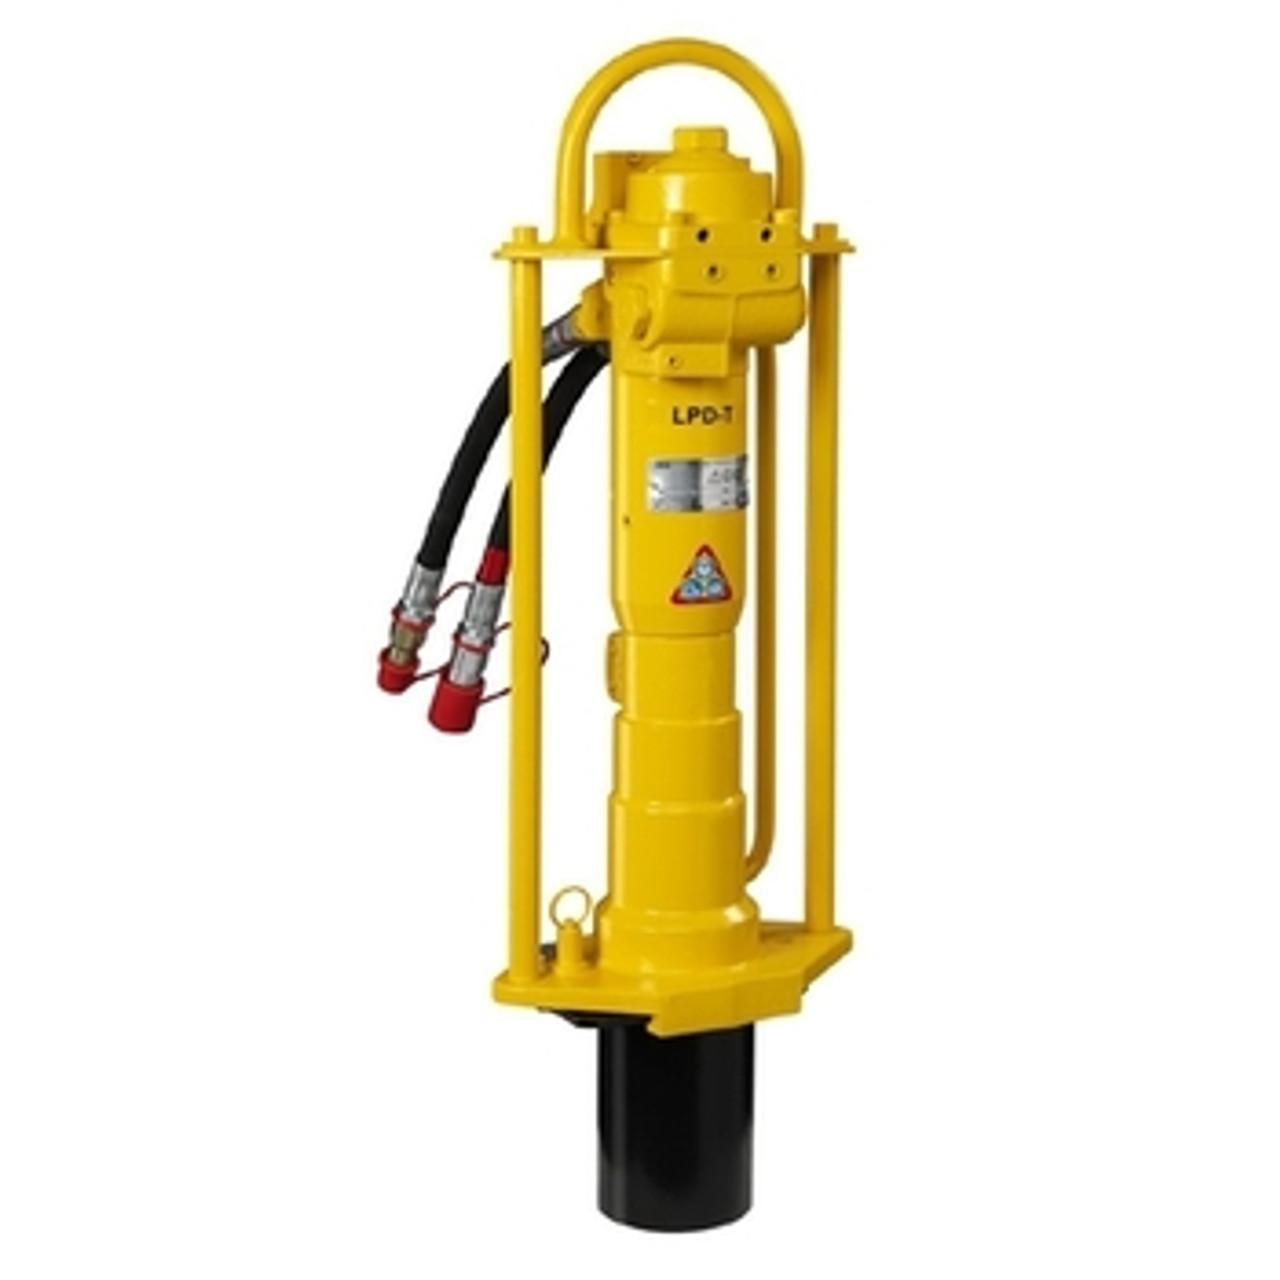 Hydraulic Post Driver